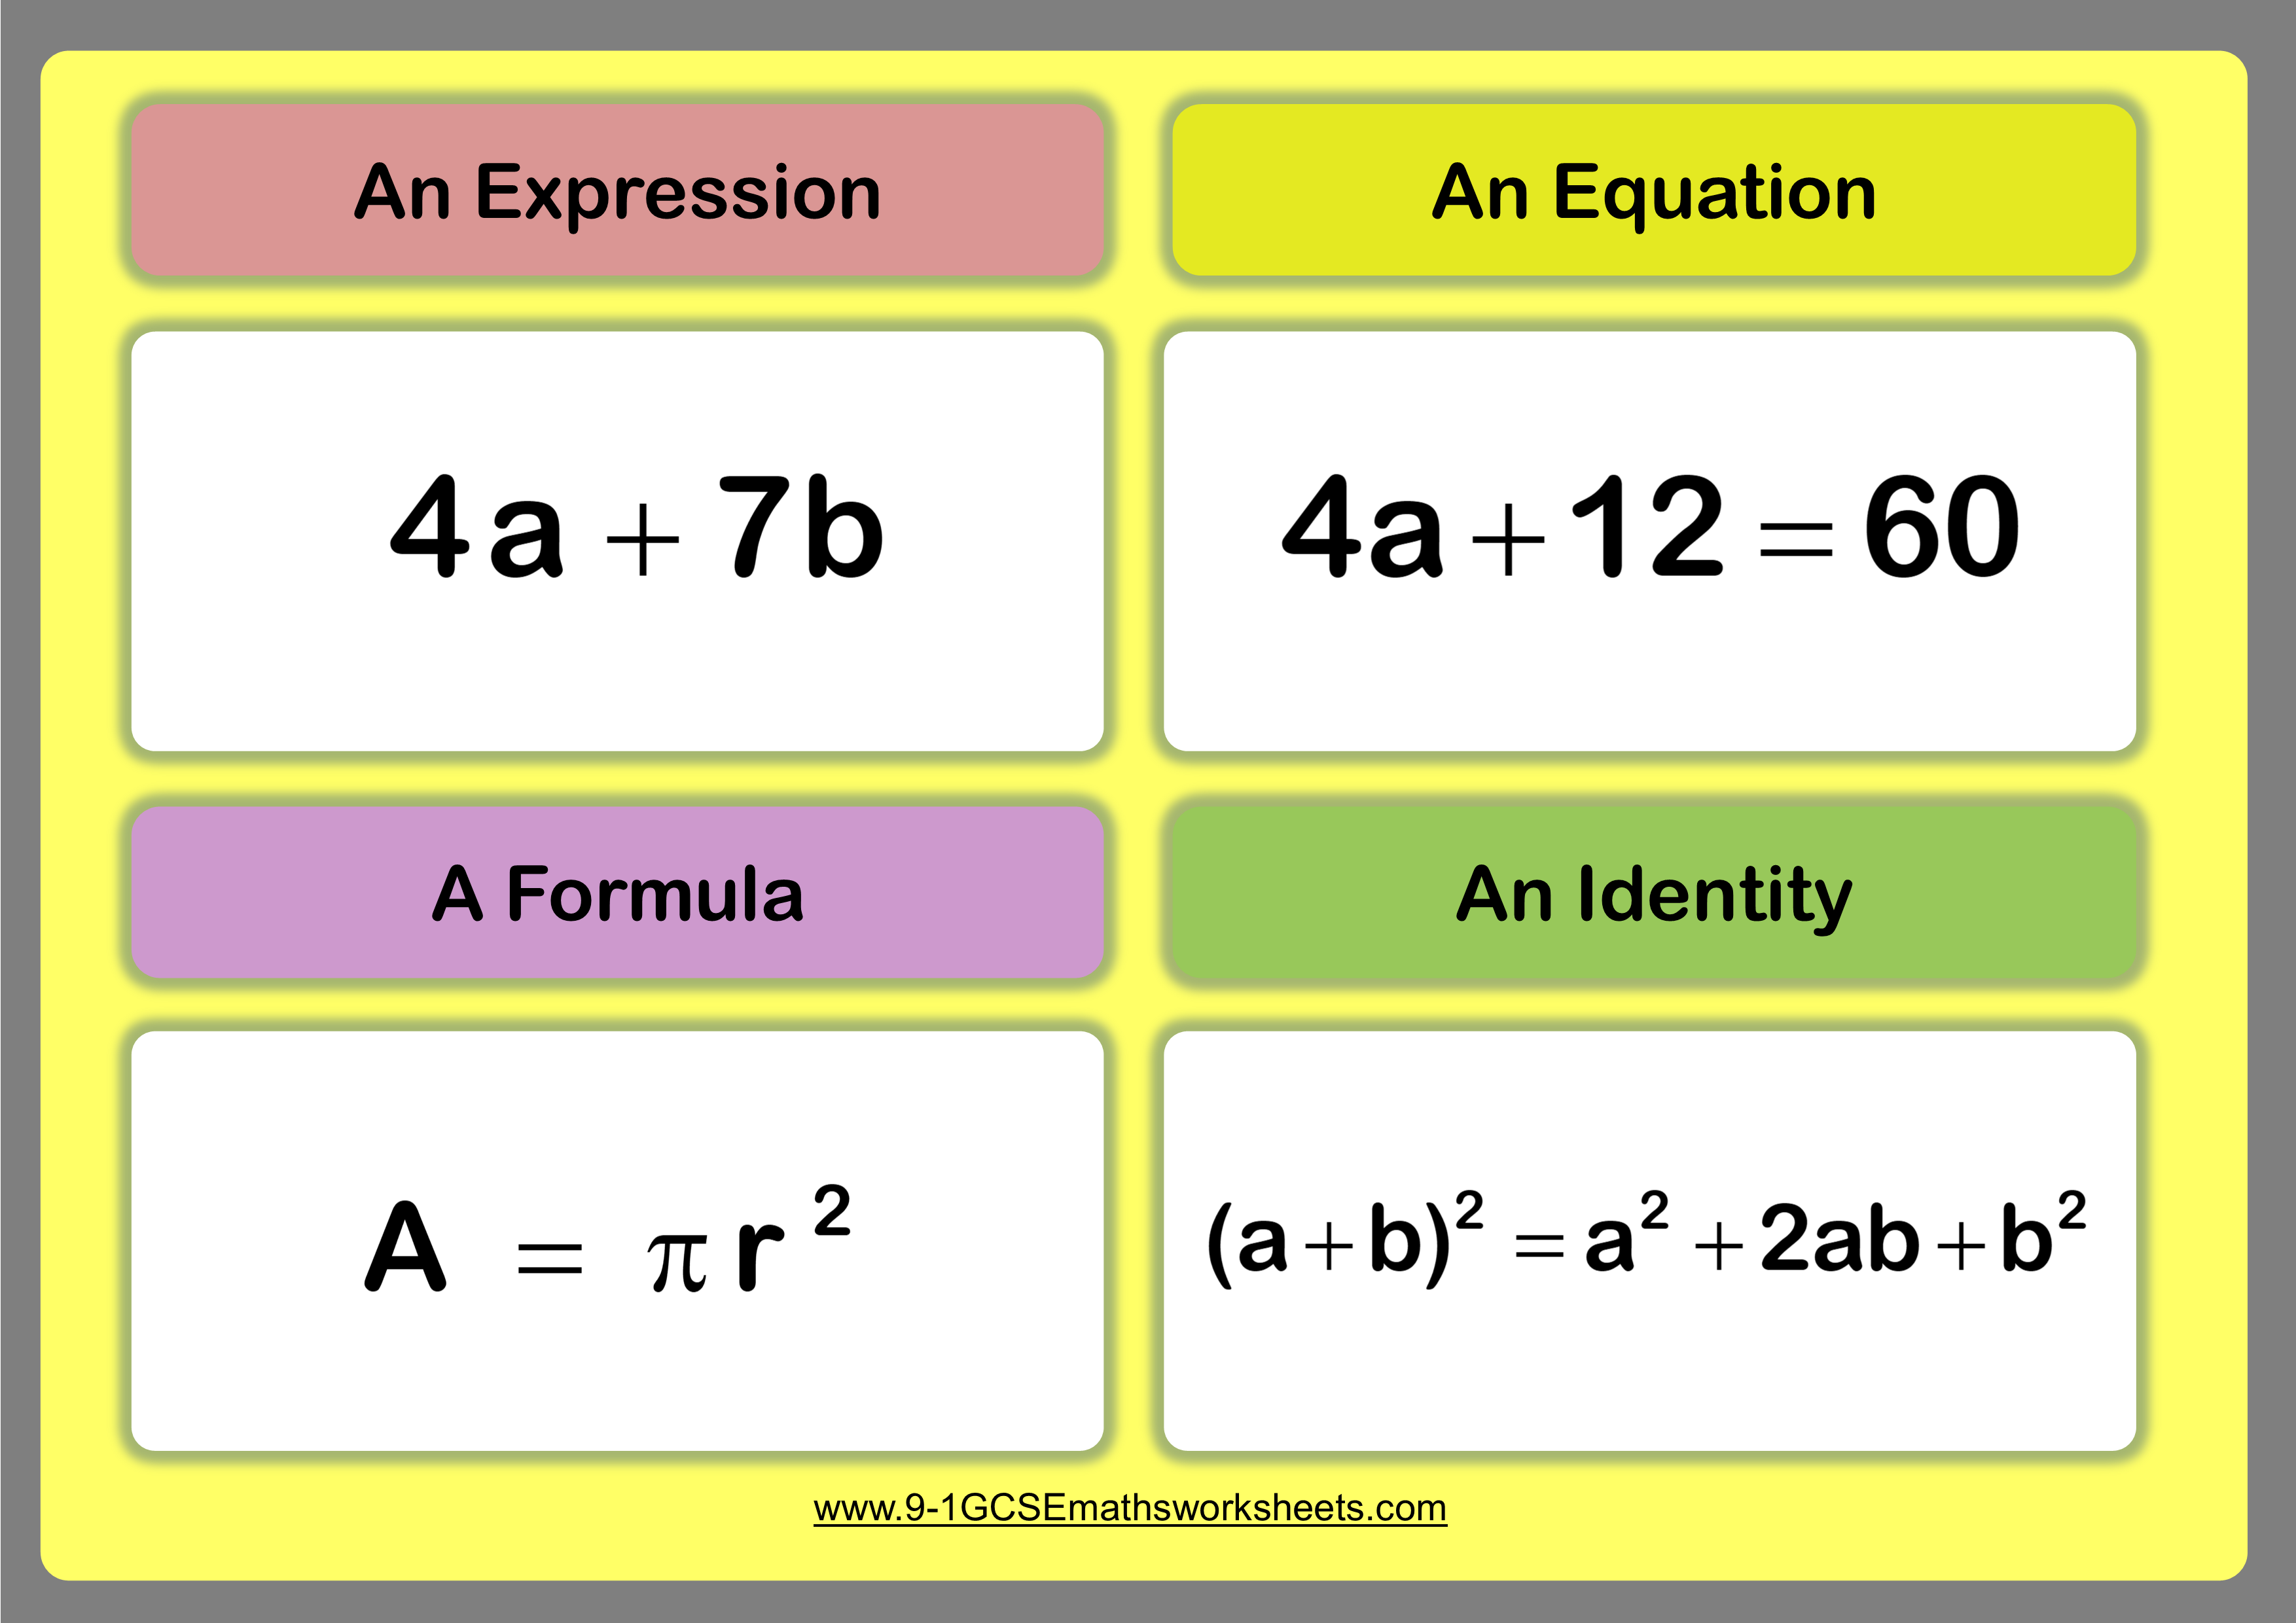 Expression Identity Formula And Equation Examples Math Expressions Algebra Worksheets Maths Algebra Formulas